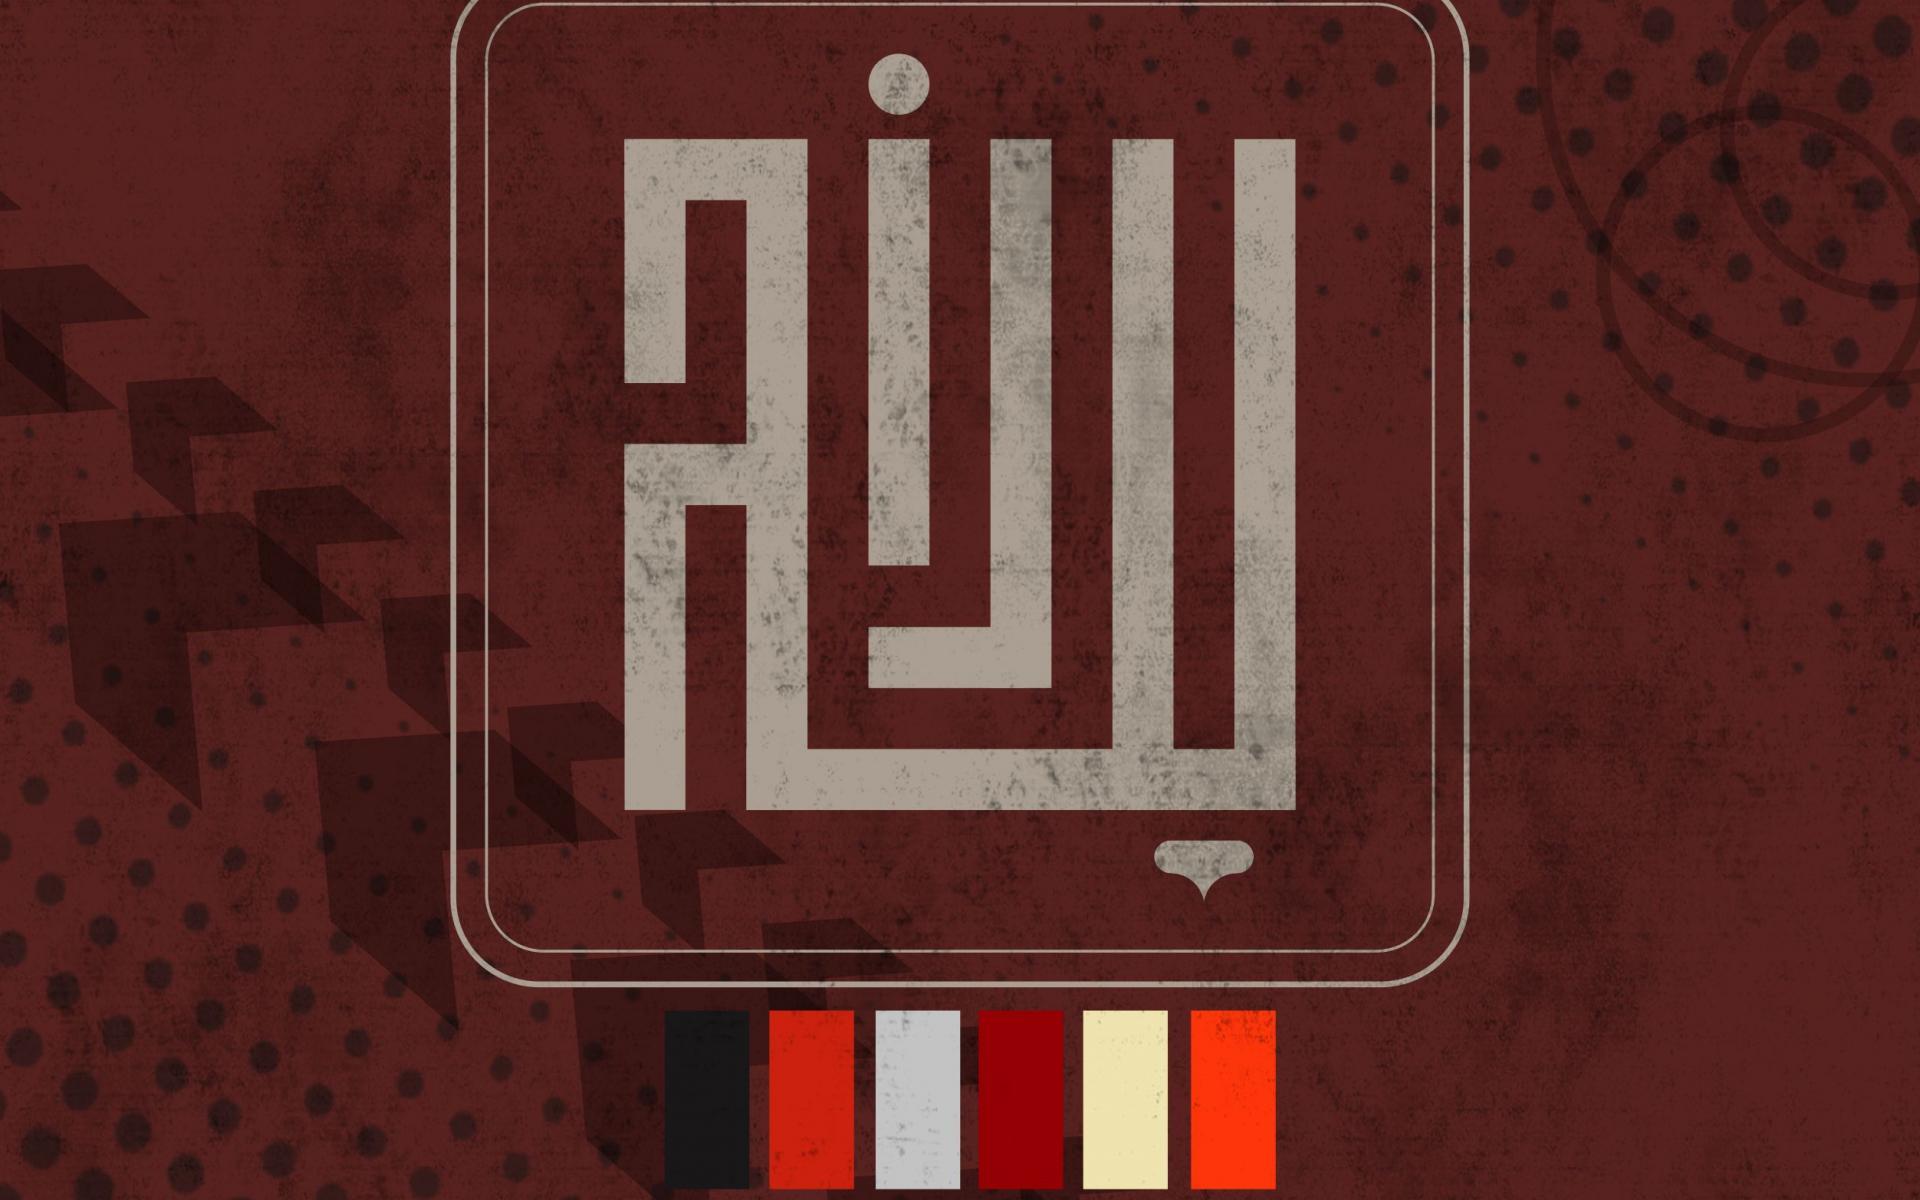 Yonatan Rukhman - Anog (CTRL SHIFT DEFEAT Remix)